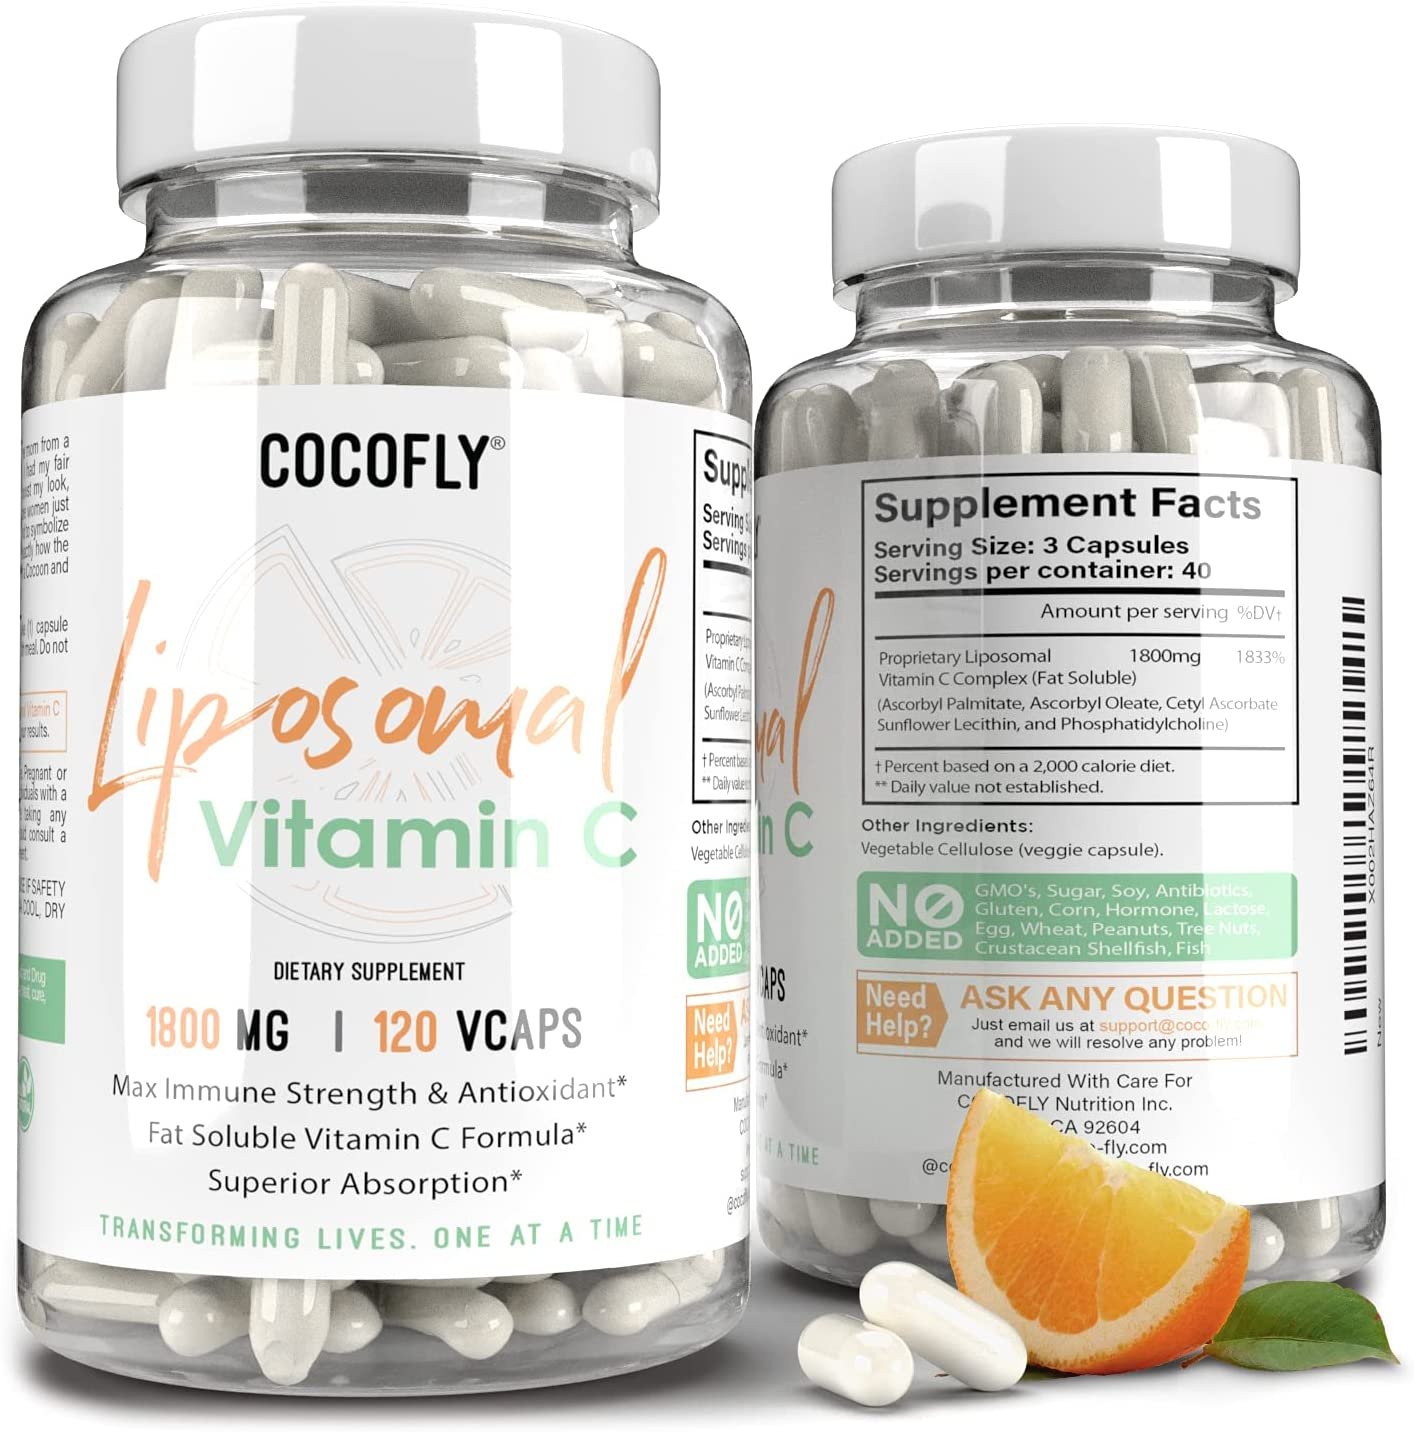 Premium Liposomal Vitamin C 120 Immune - NEW before selling ☆ Award-winning store 1800mg System VCAPS